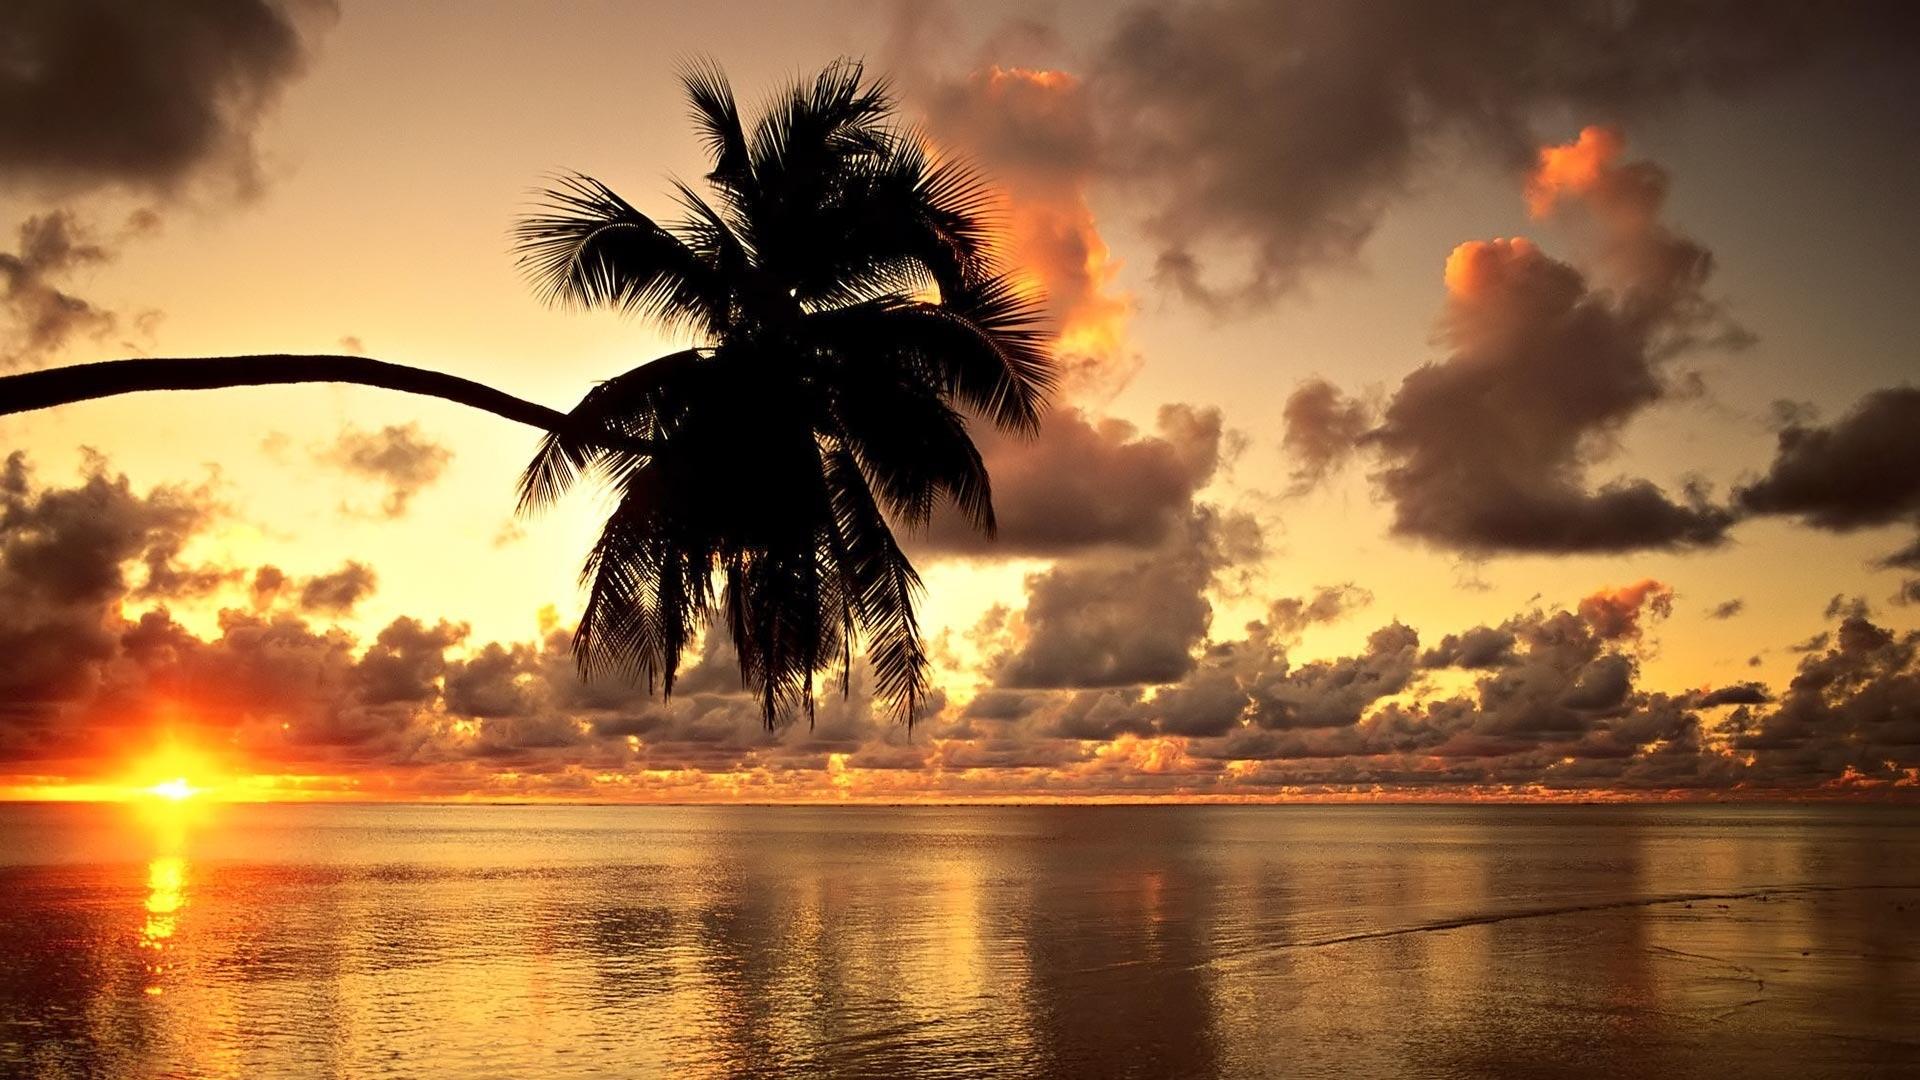 Hawaiian Sunset HD Beach Wallpapers 1080p   HD Wallpapers Source